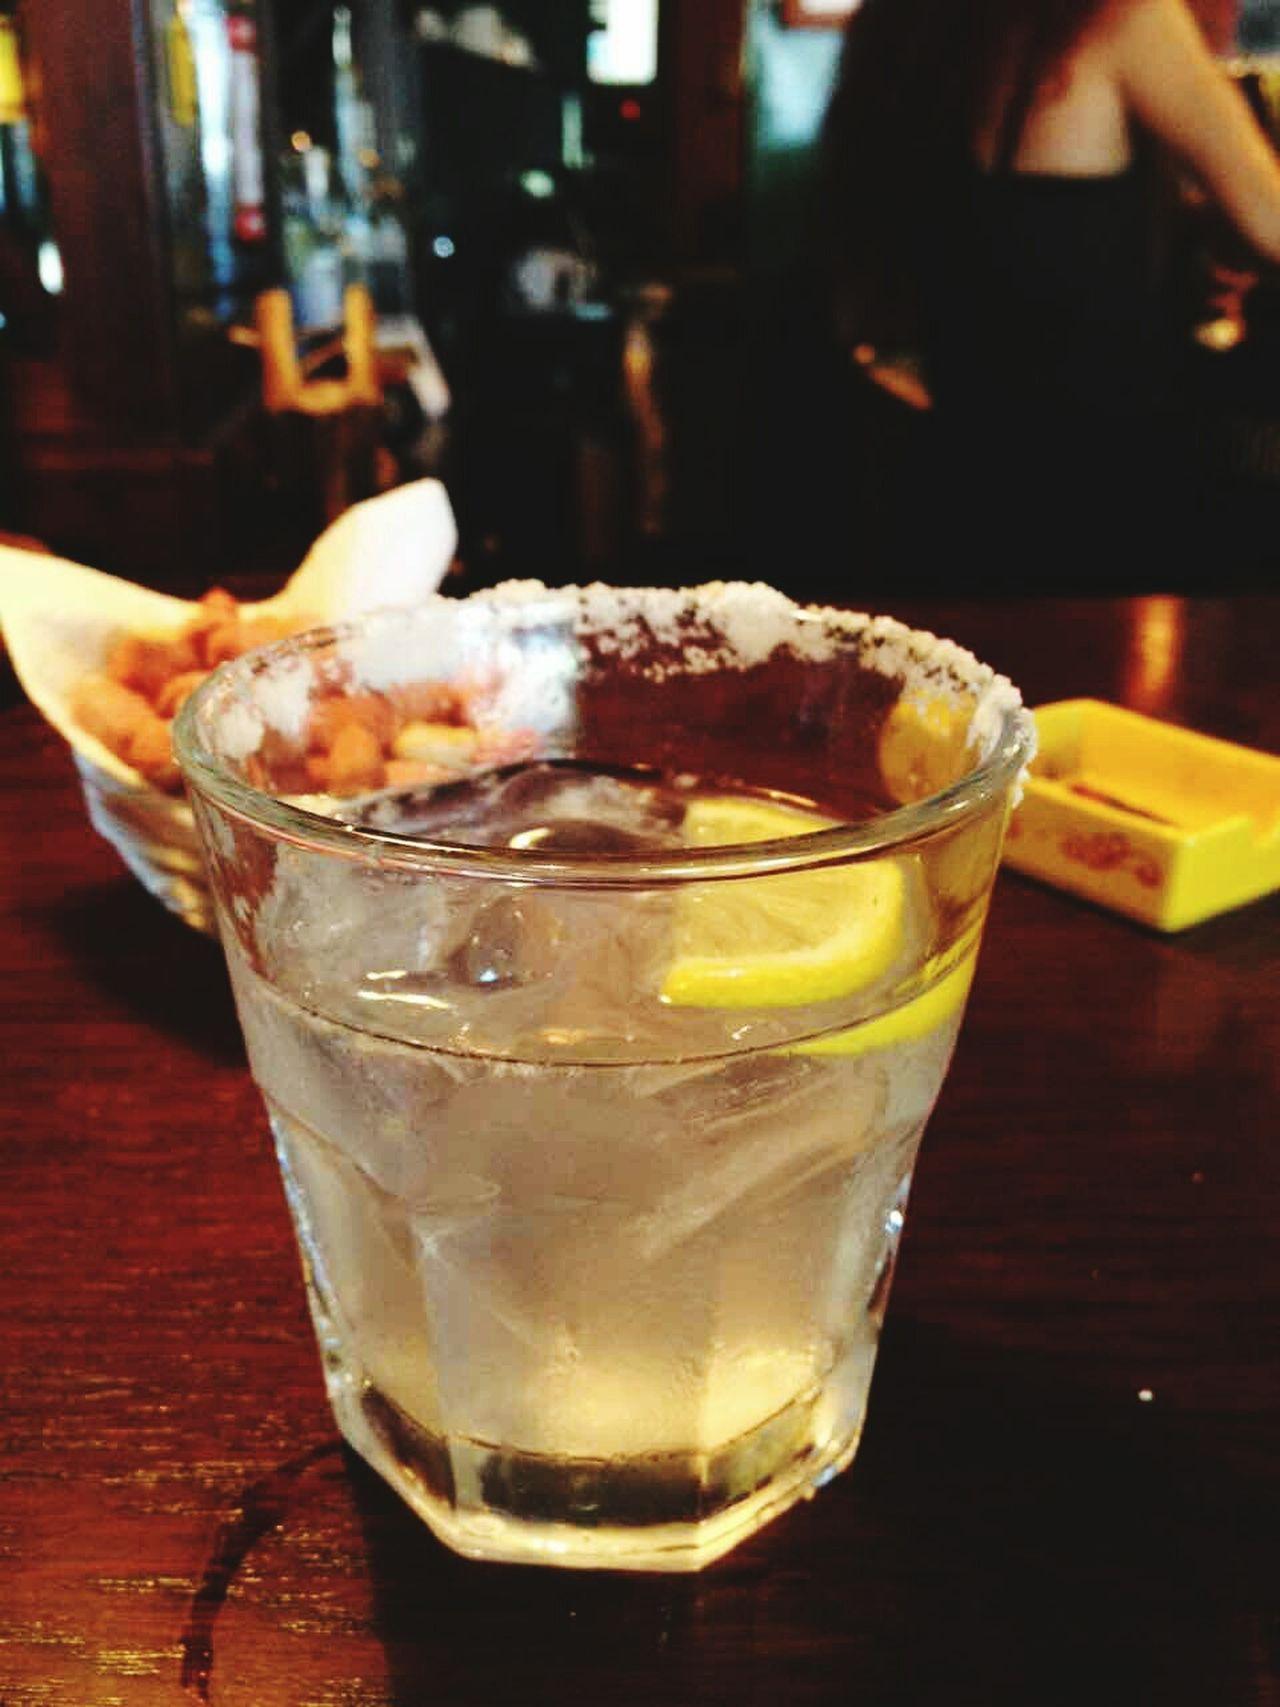 Bar Drink Margaritas Cool Relaxing Enjoying Life Habbits Momments Kastoria Svoura Greece